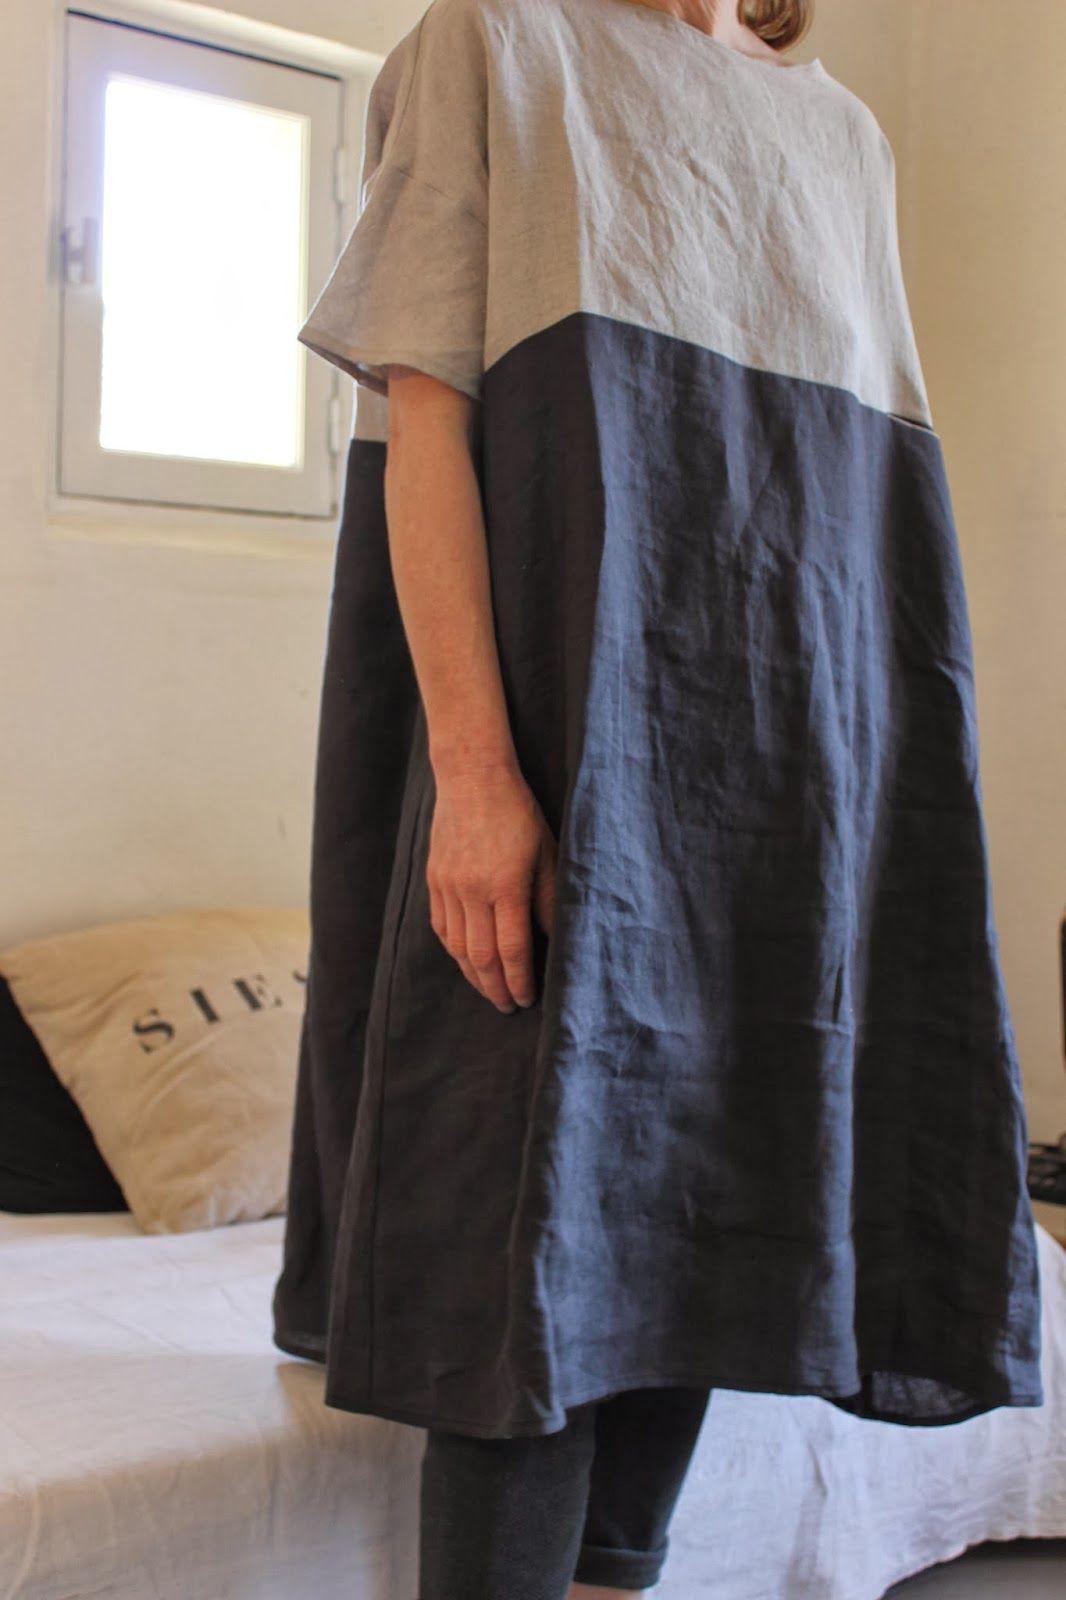 les armoires vides uzes small sewing pinterest mode. Black Bedroom Furniture Sets. Home Design Ideas